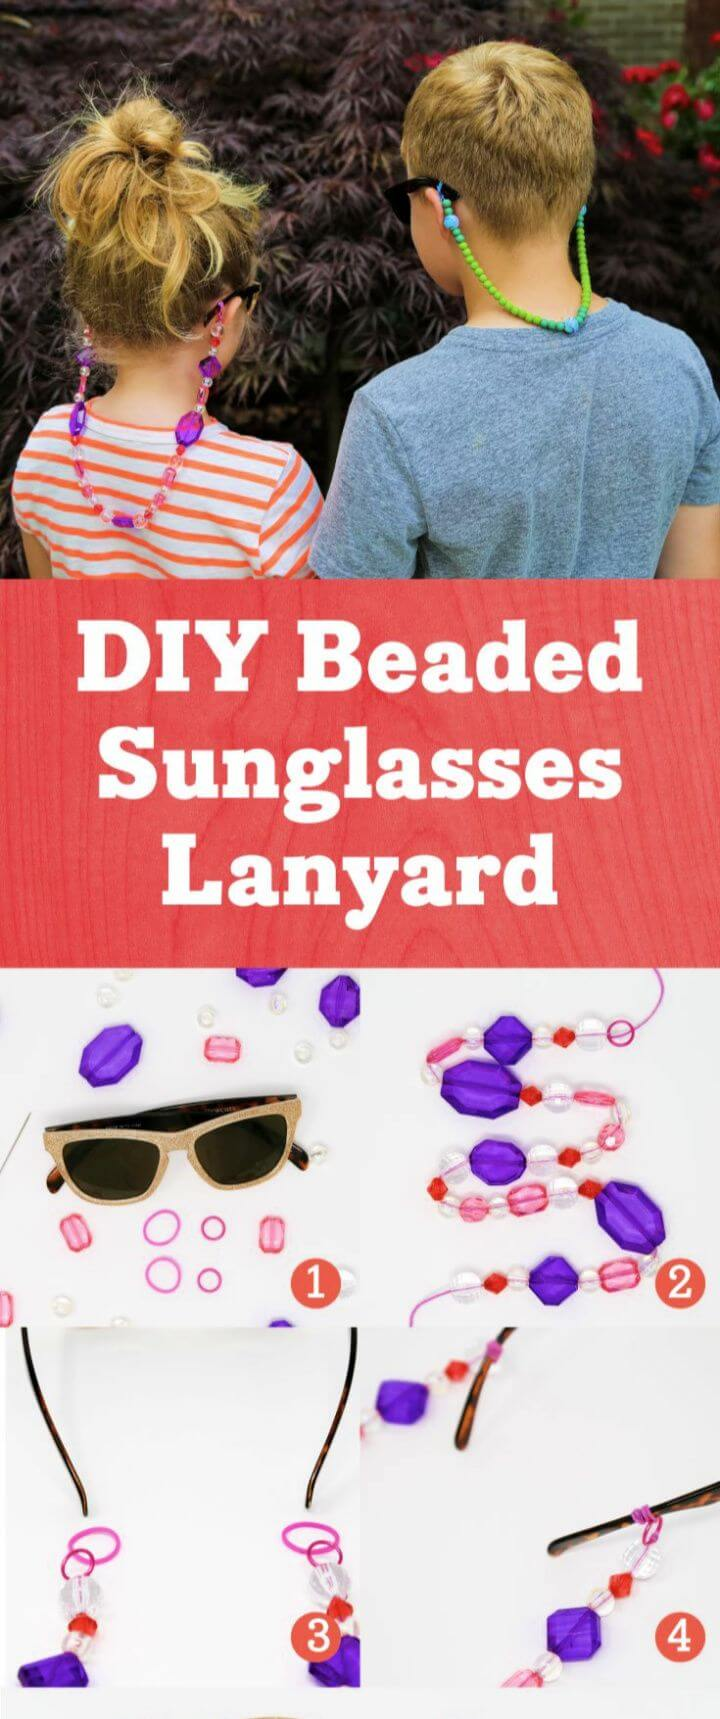 How To Create DIY Beaded Sunglasses Lanyard